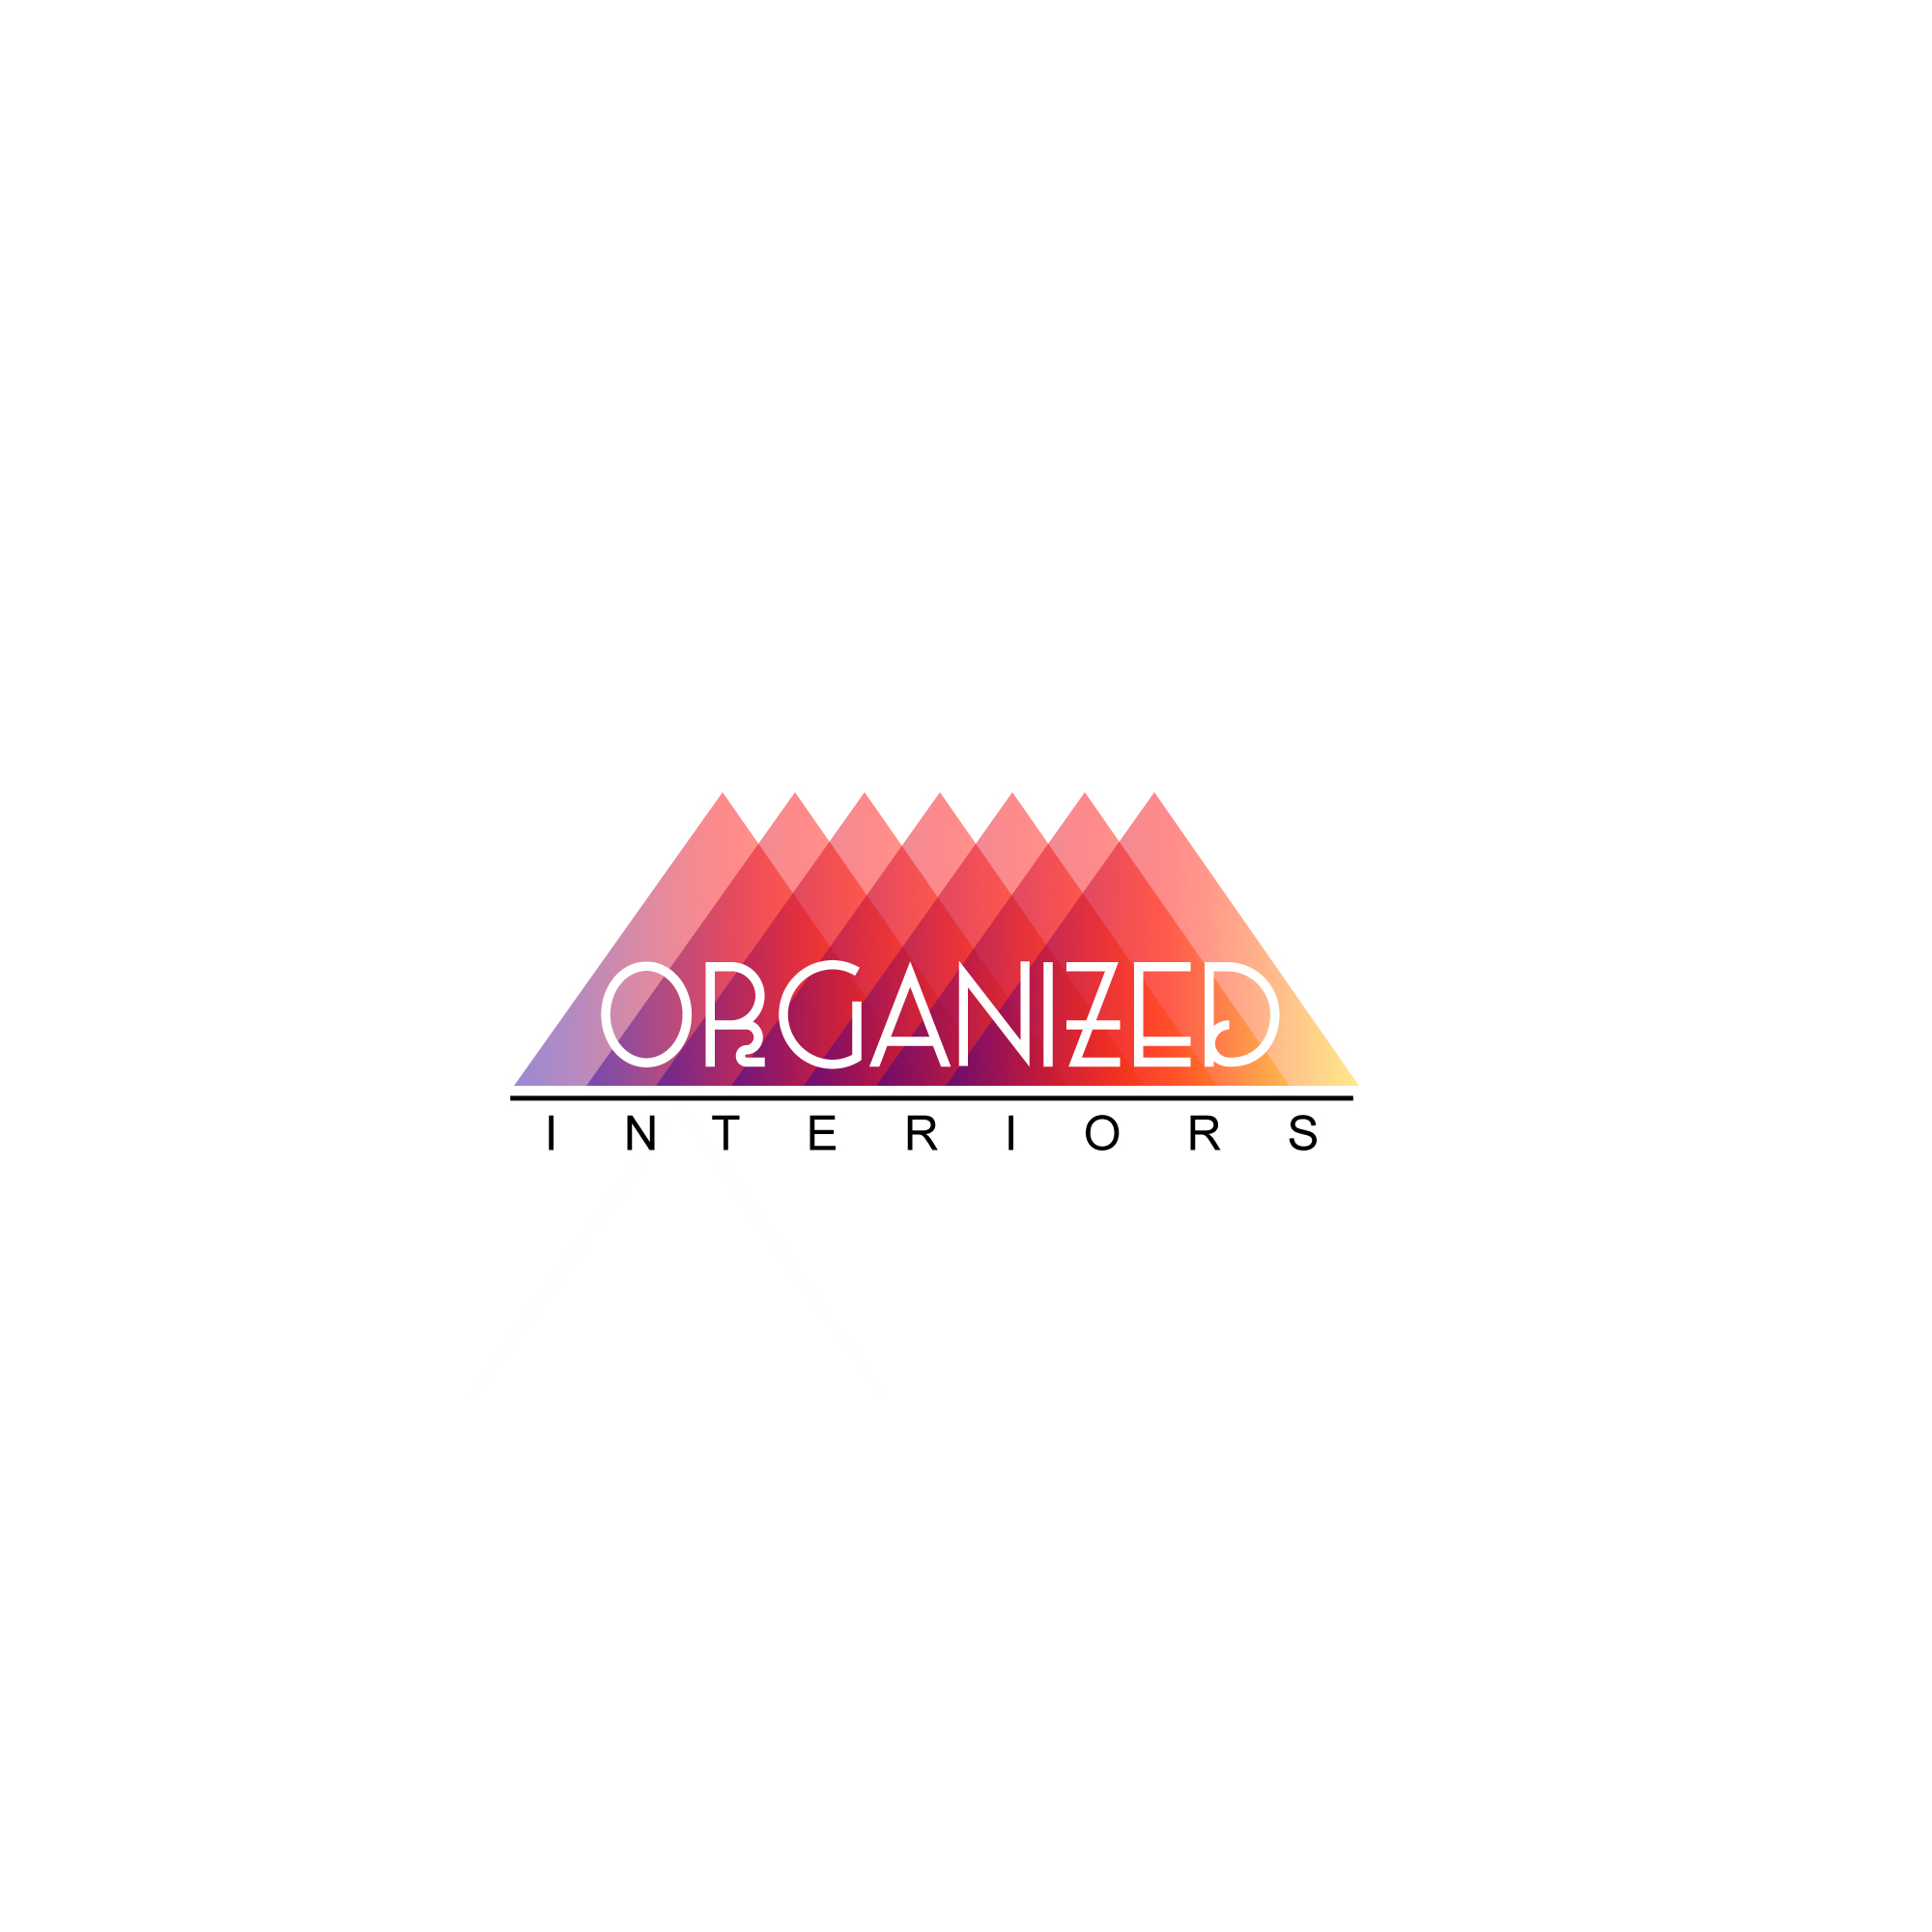 Logo Design by Utkarsh Bhandari - Entry No. 107 in the Logo Design Contest Imaginative Logo Design for Organized Interiors.